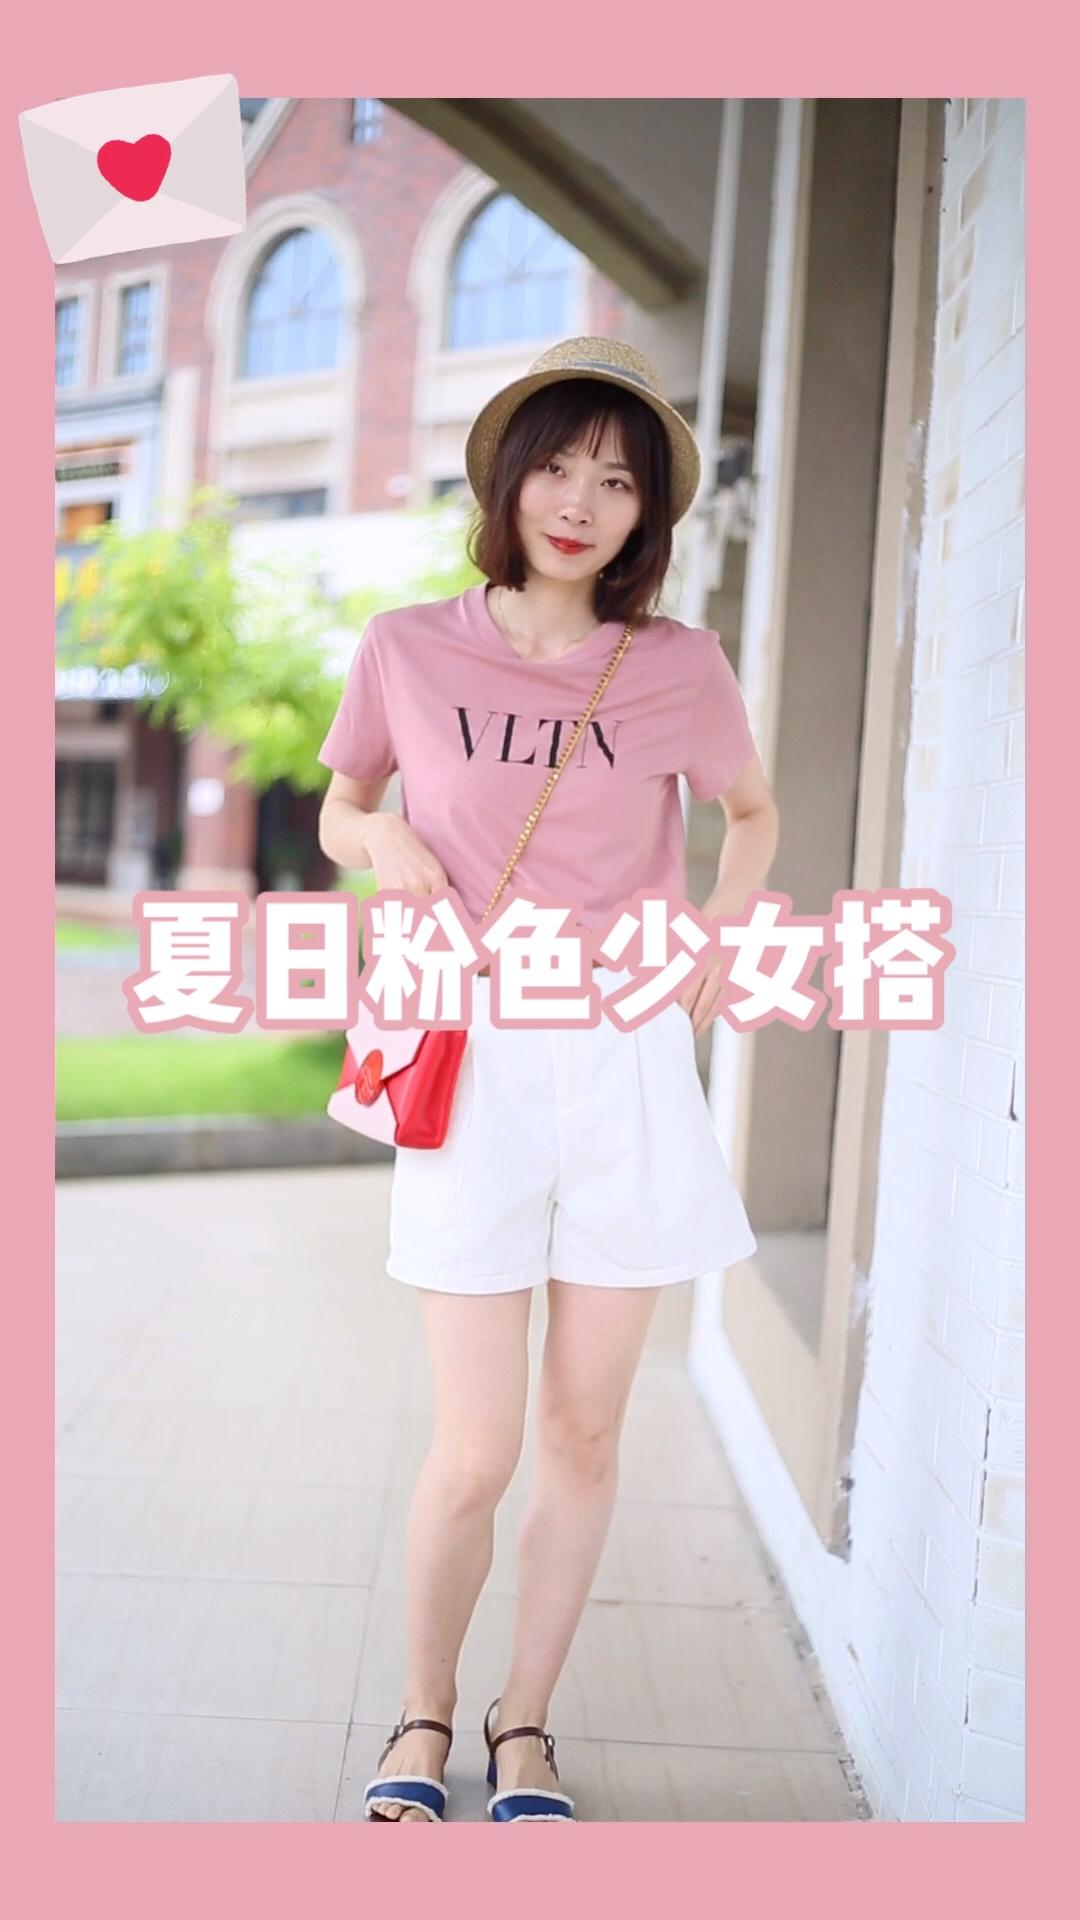 #Lolita合集:高甜少女都在这里!# 粉色加白色的搭配也是很夏天的色彩呀 清新甜美感扑面而来 白色的高腰短裤百搭实用 各种风格都可以打造 粉色拼色链条包也非常好看哦